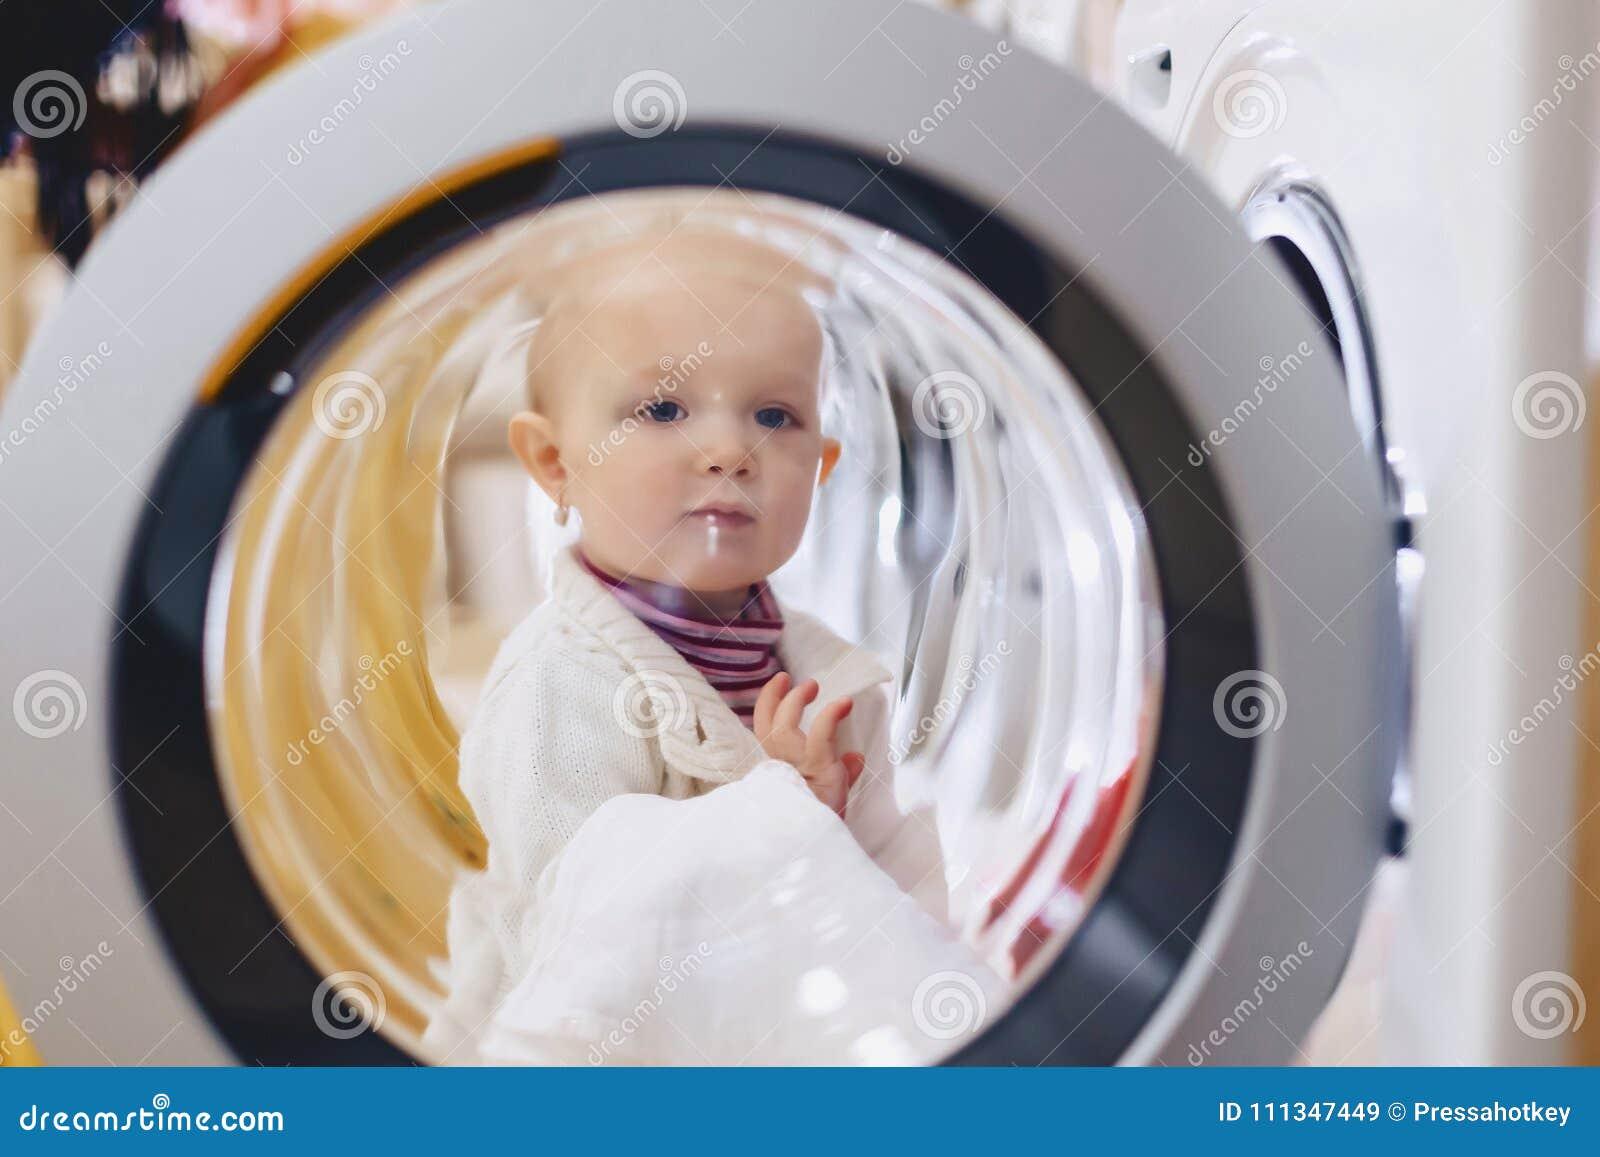 The baby looks through the window of the washing machine